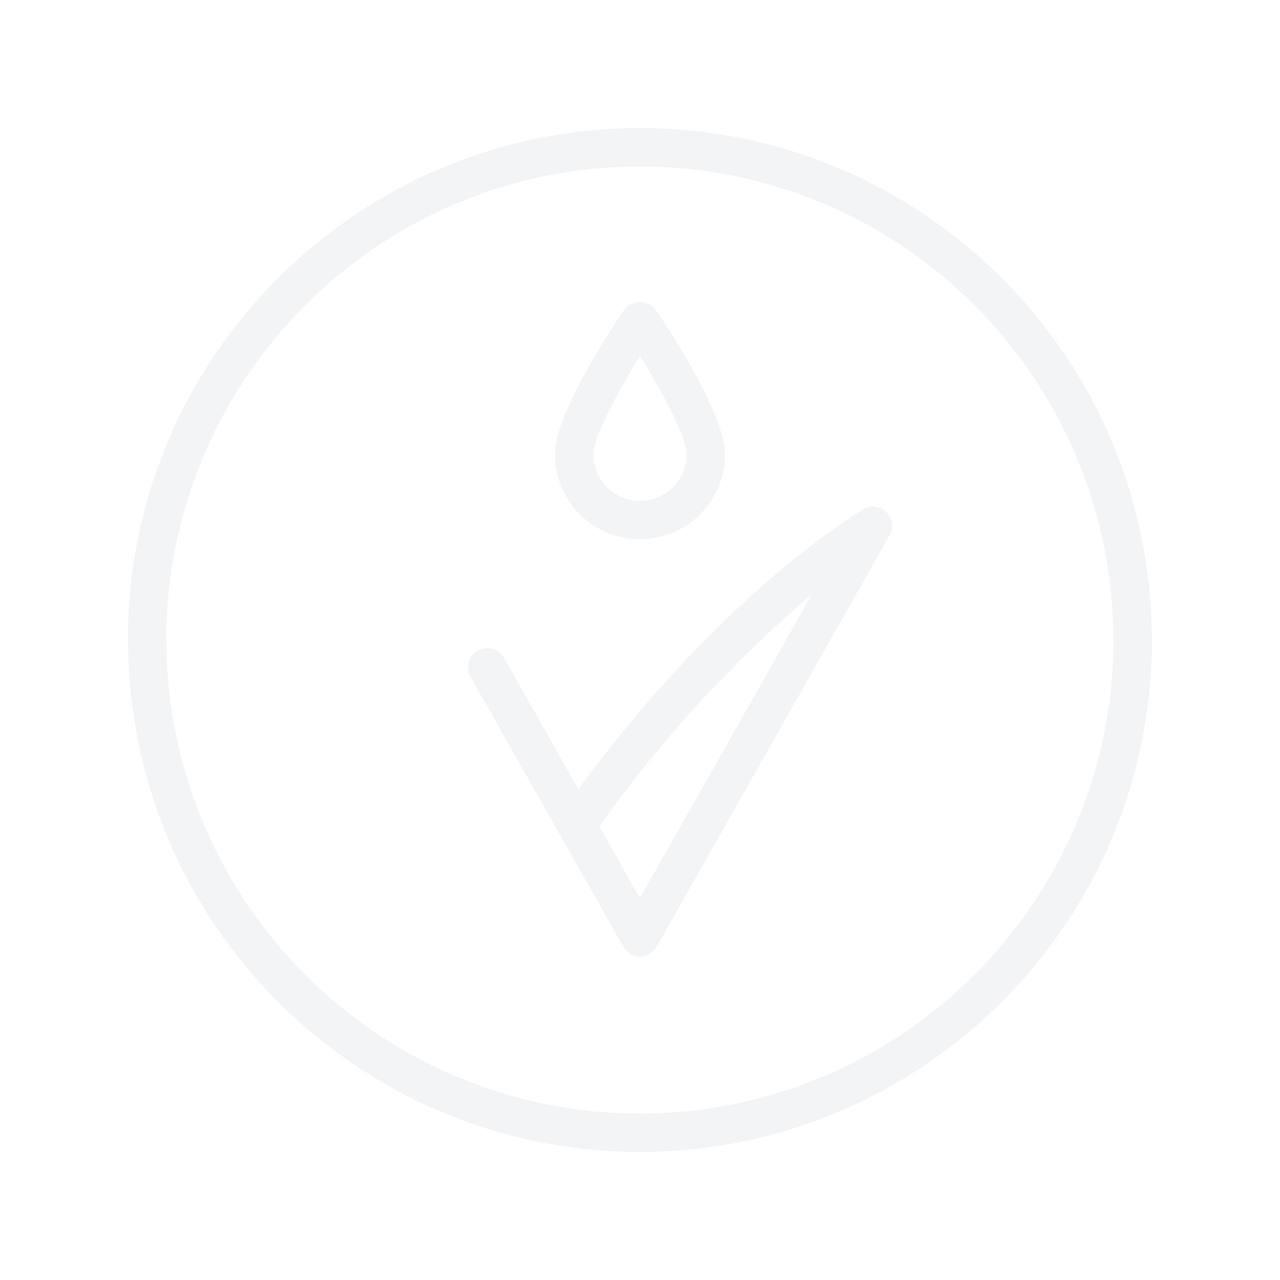 HOLIKA HOLIKA Prime Youth Black Snail Repair Hydro-Gel Mask 25g